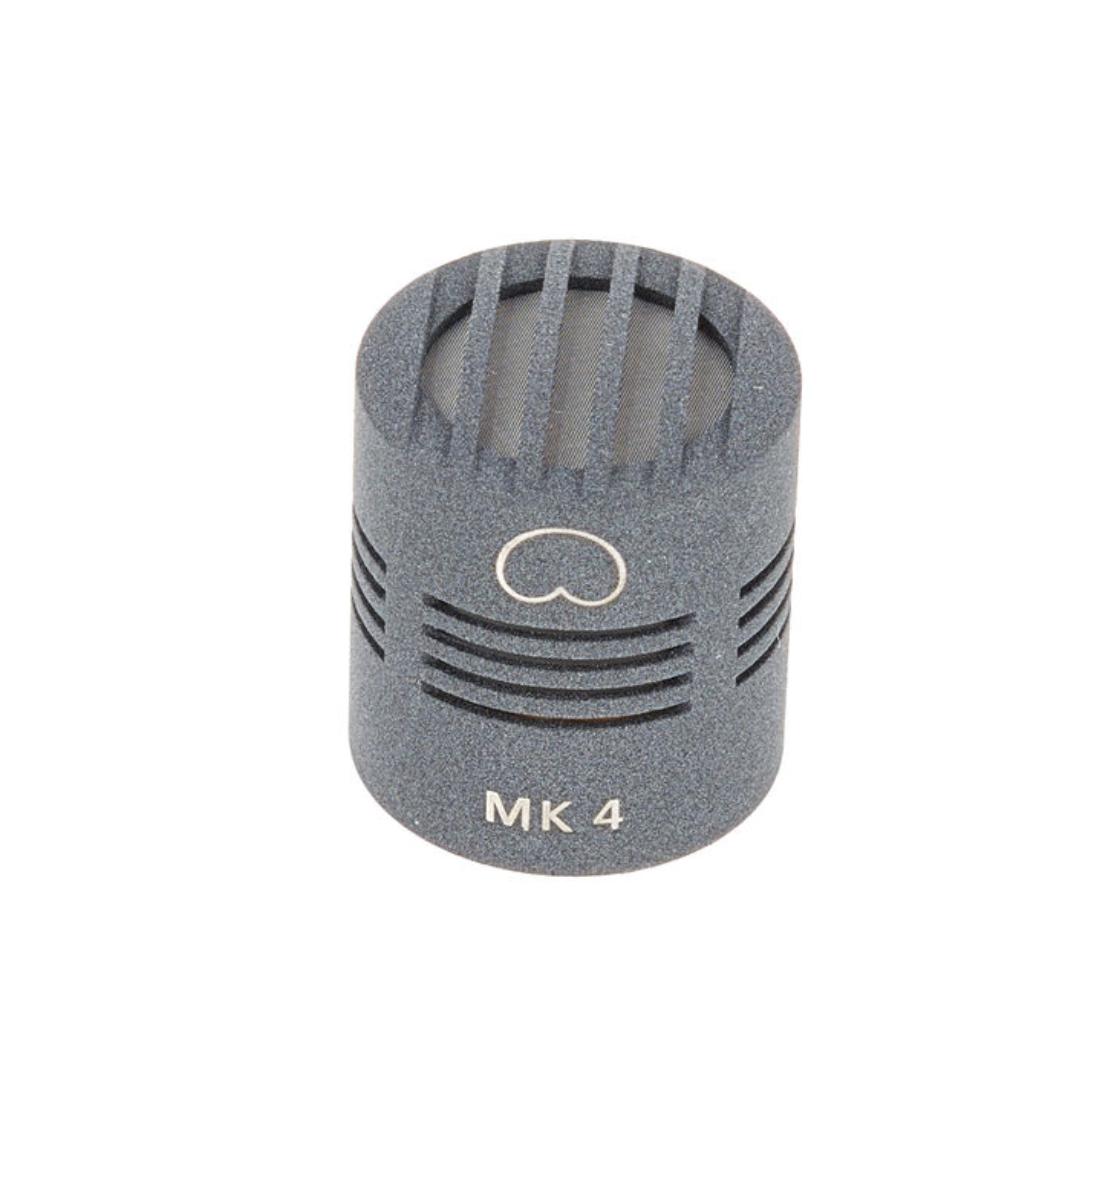 CÁPSULA P/MICROFONE SCHOEPS MK4 CARDIOID